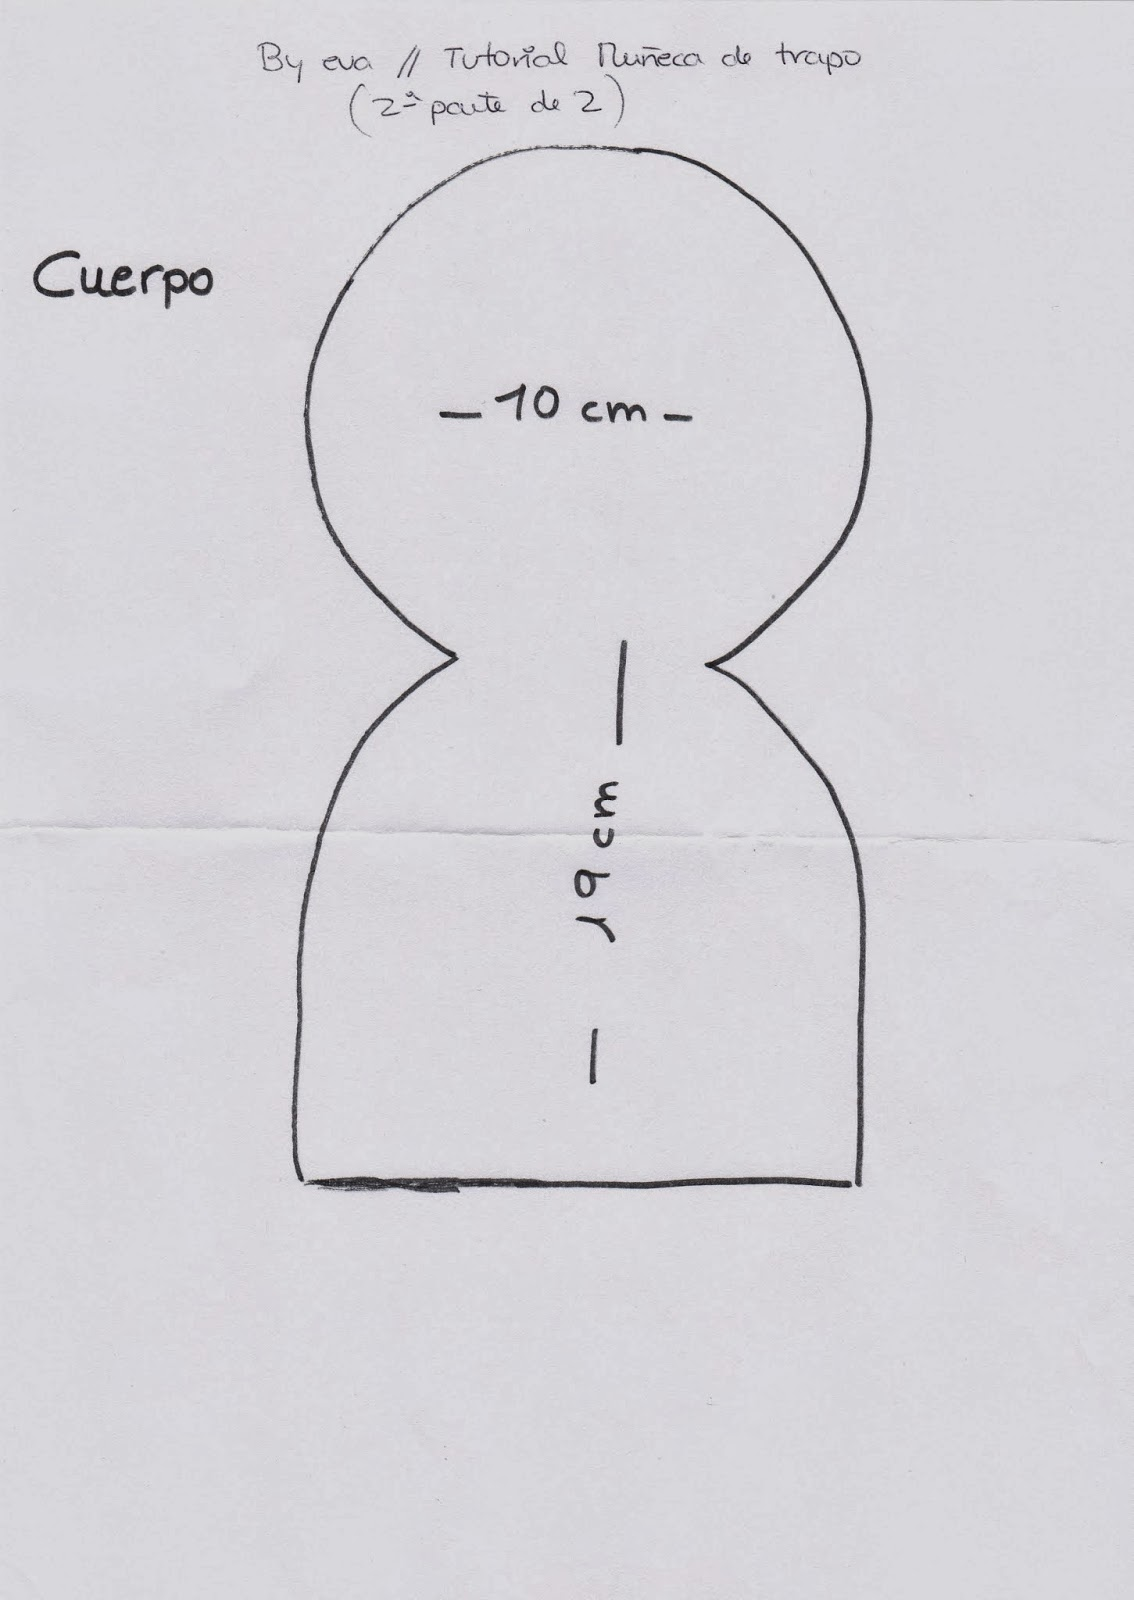 By eva: YOUTUBE: Tutorial muñeca de trapo